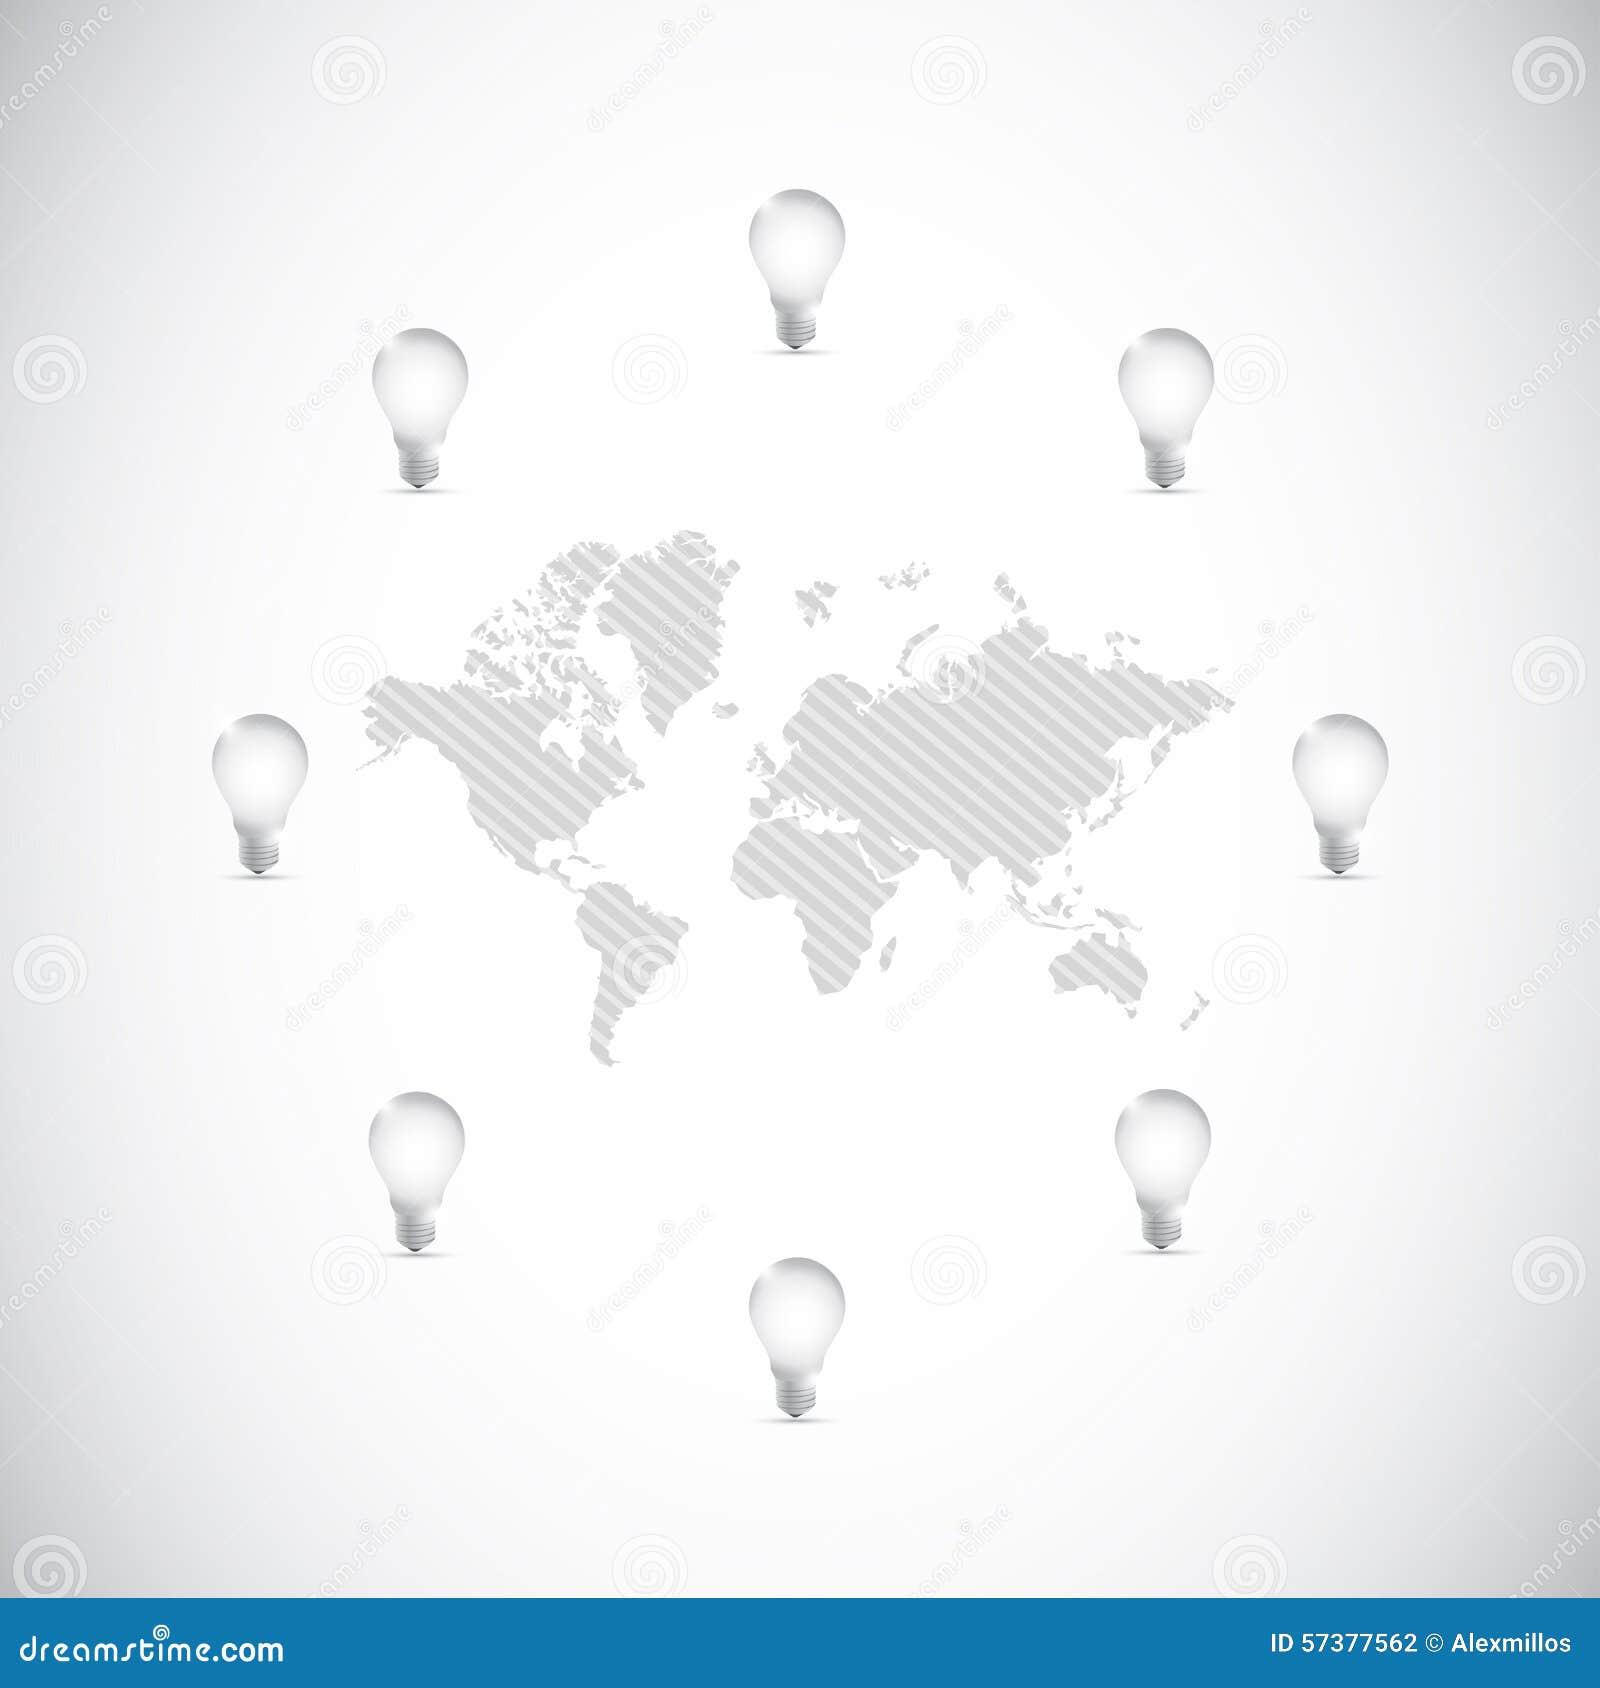 Ideeën rond het bolconcept